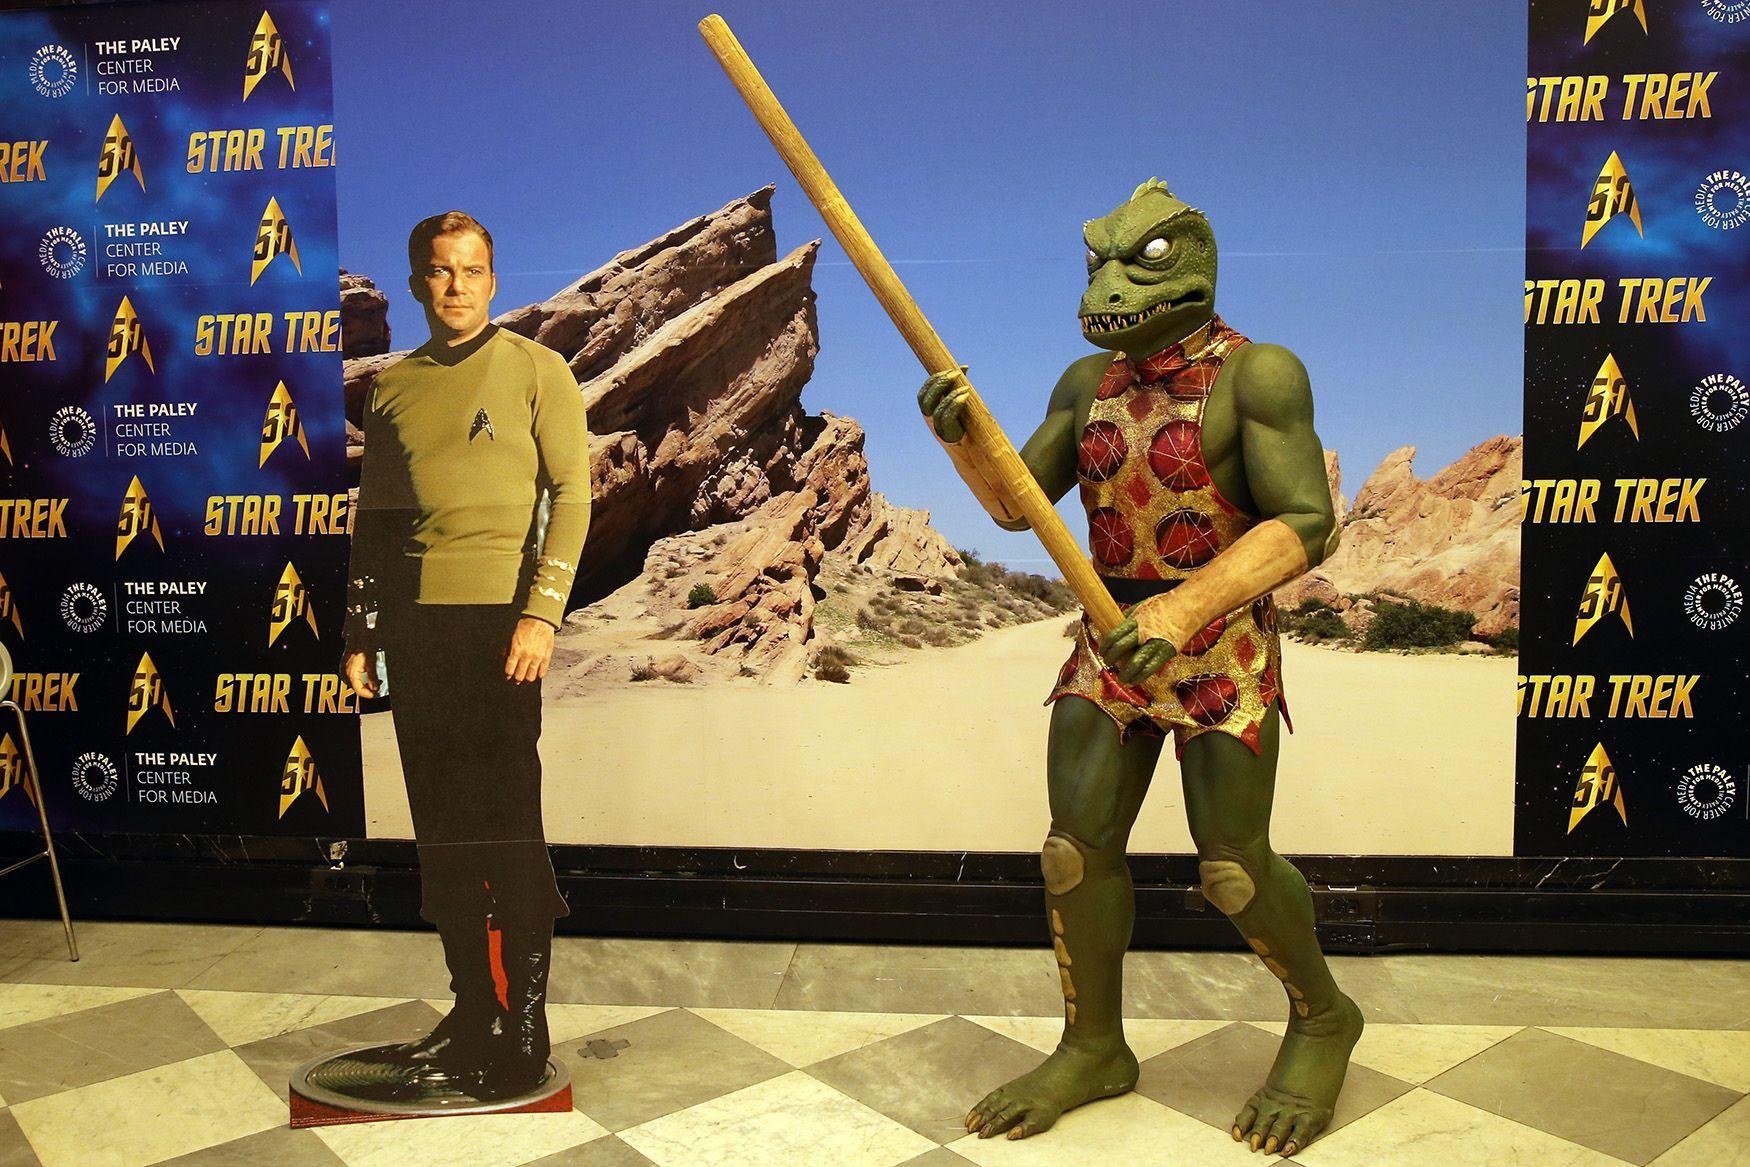 'Star Trek' 50th anniversary exhibit